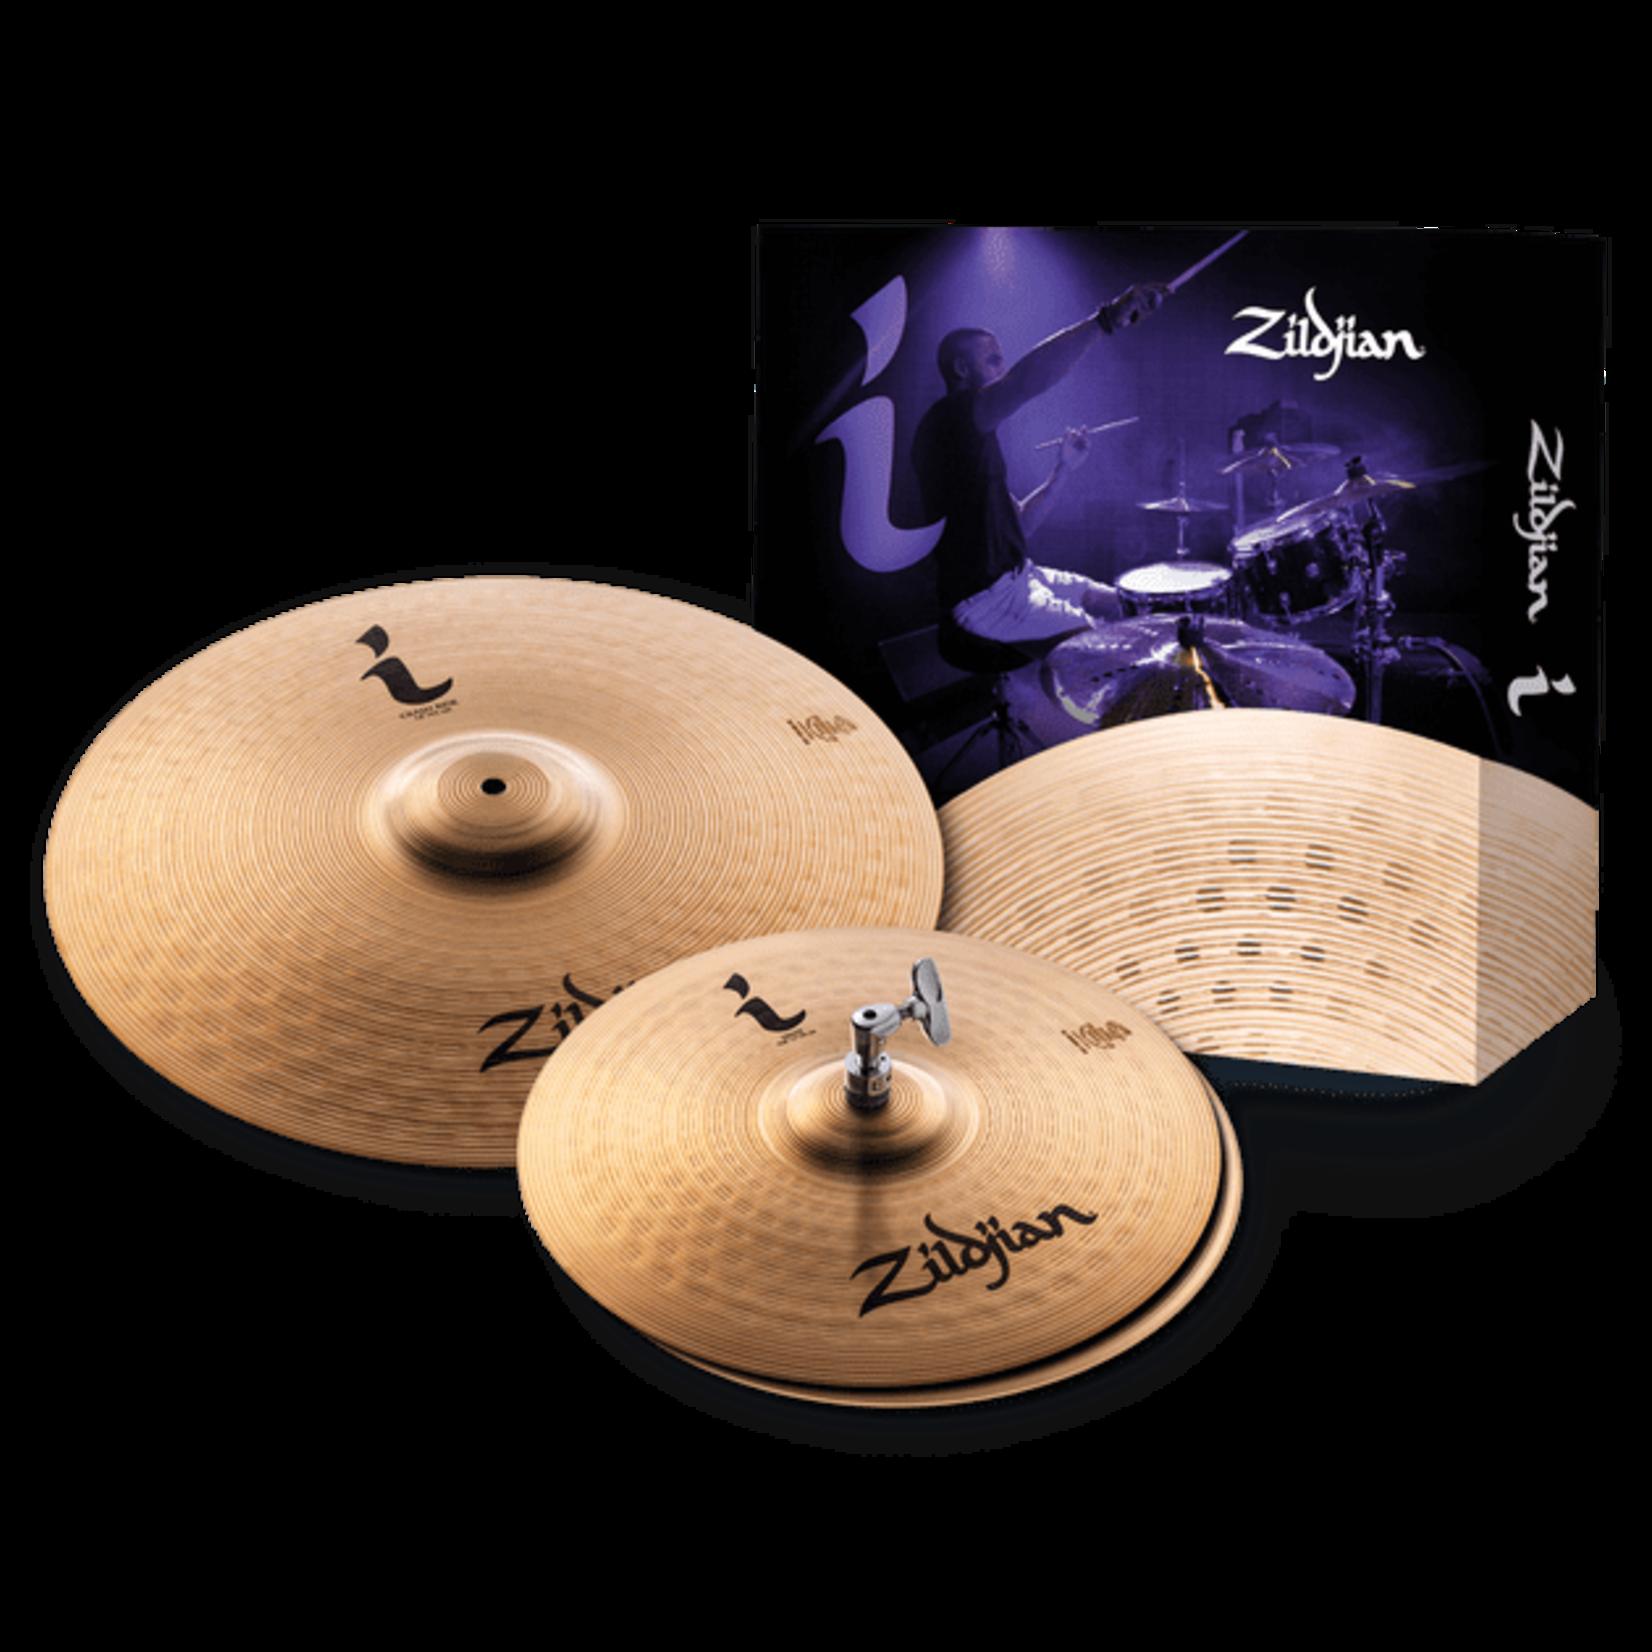 Zildjian Zildjian I Essentials Cymbal Pack